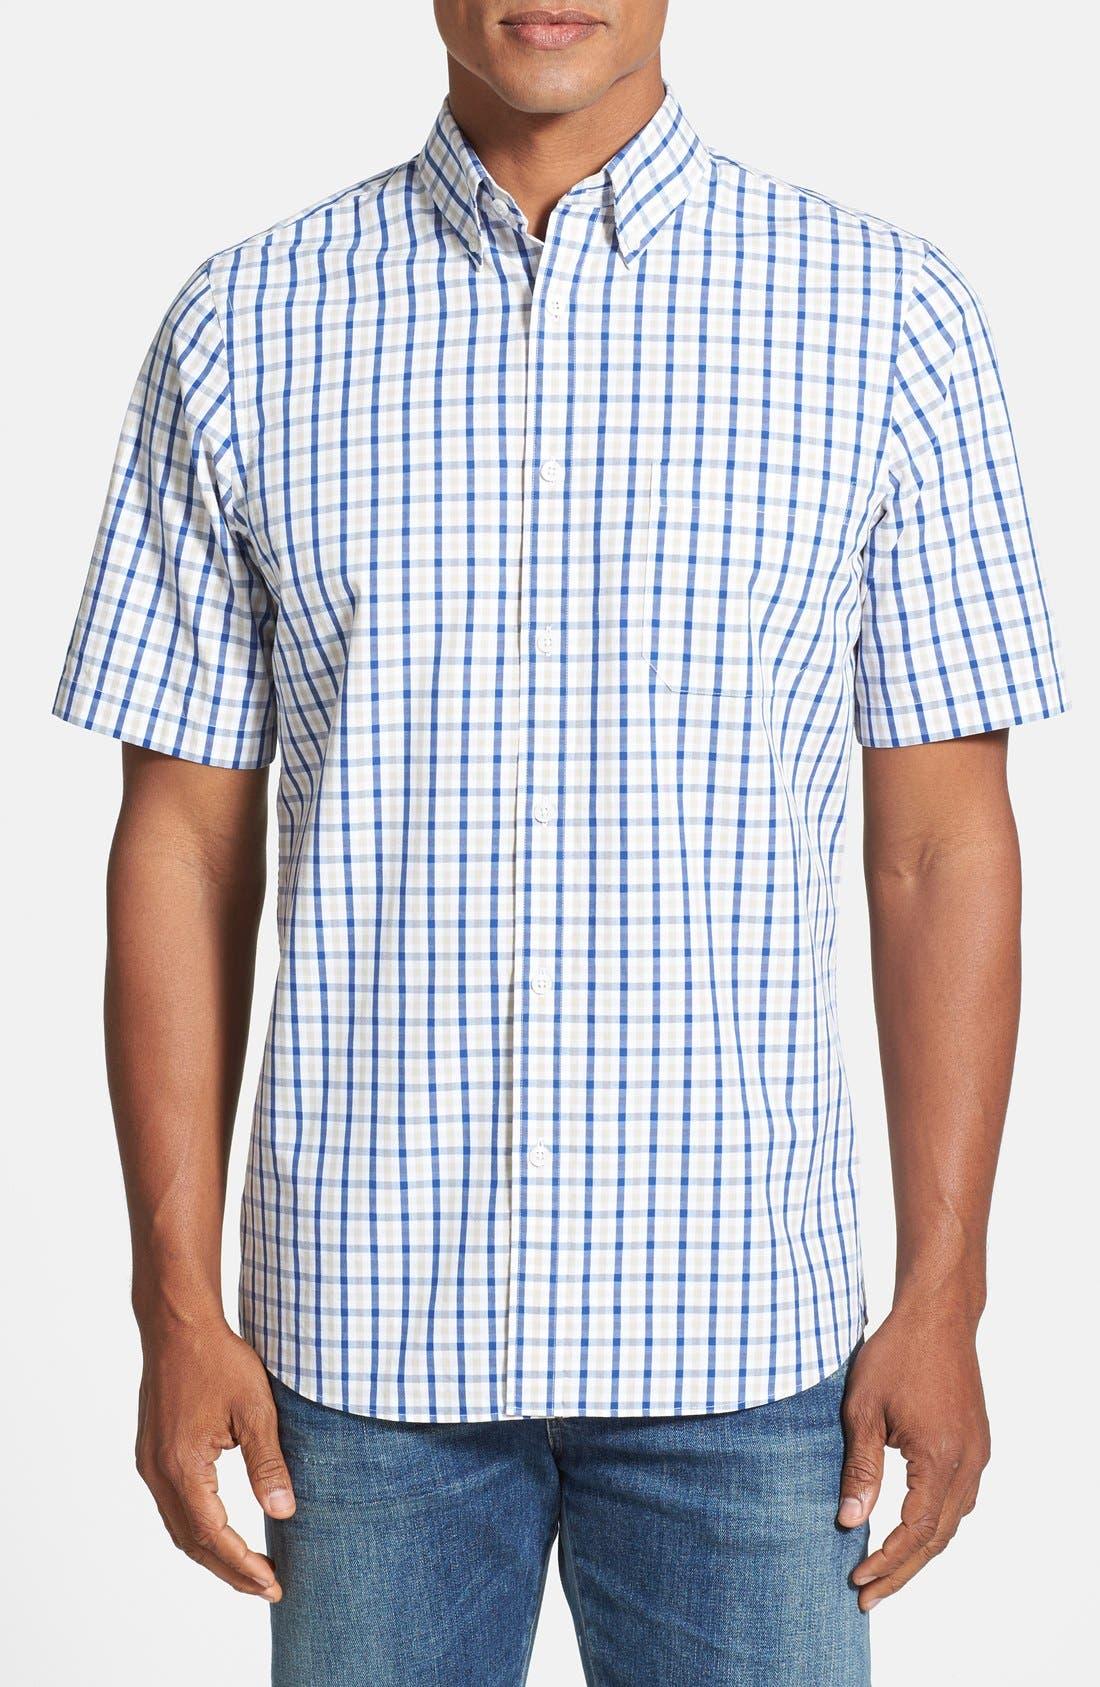 Alternate Image 1 Selected - Nordstrom Regular Fit Short Sleeve Woven Sport Shirt